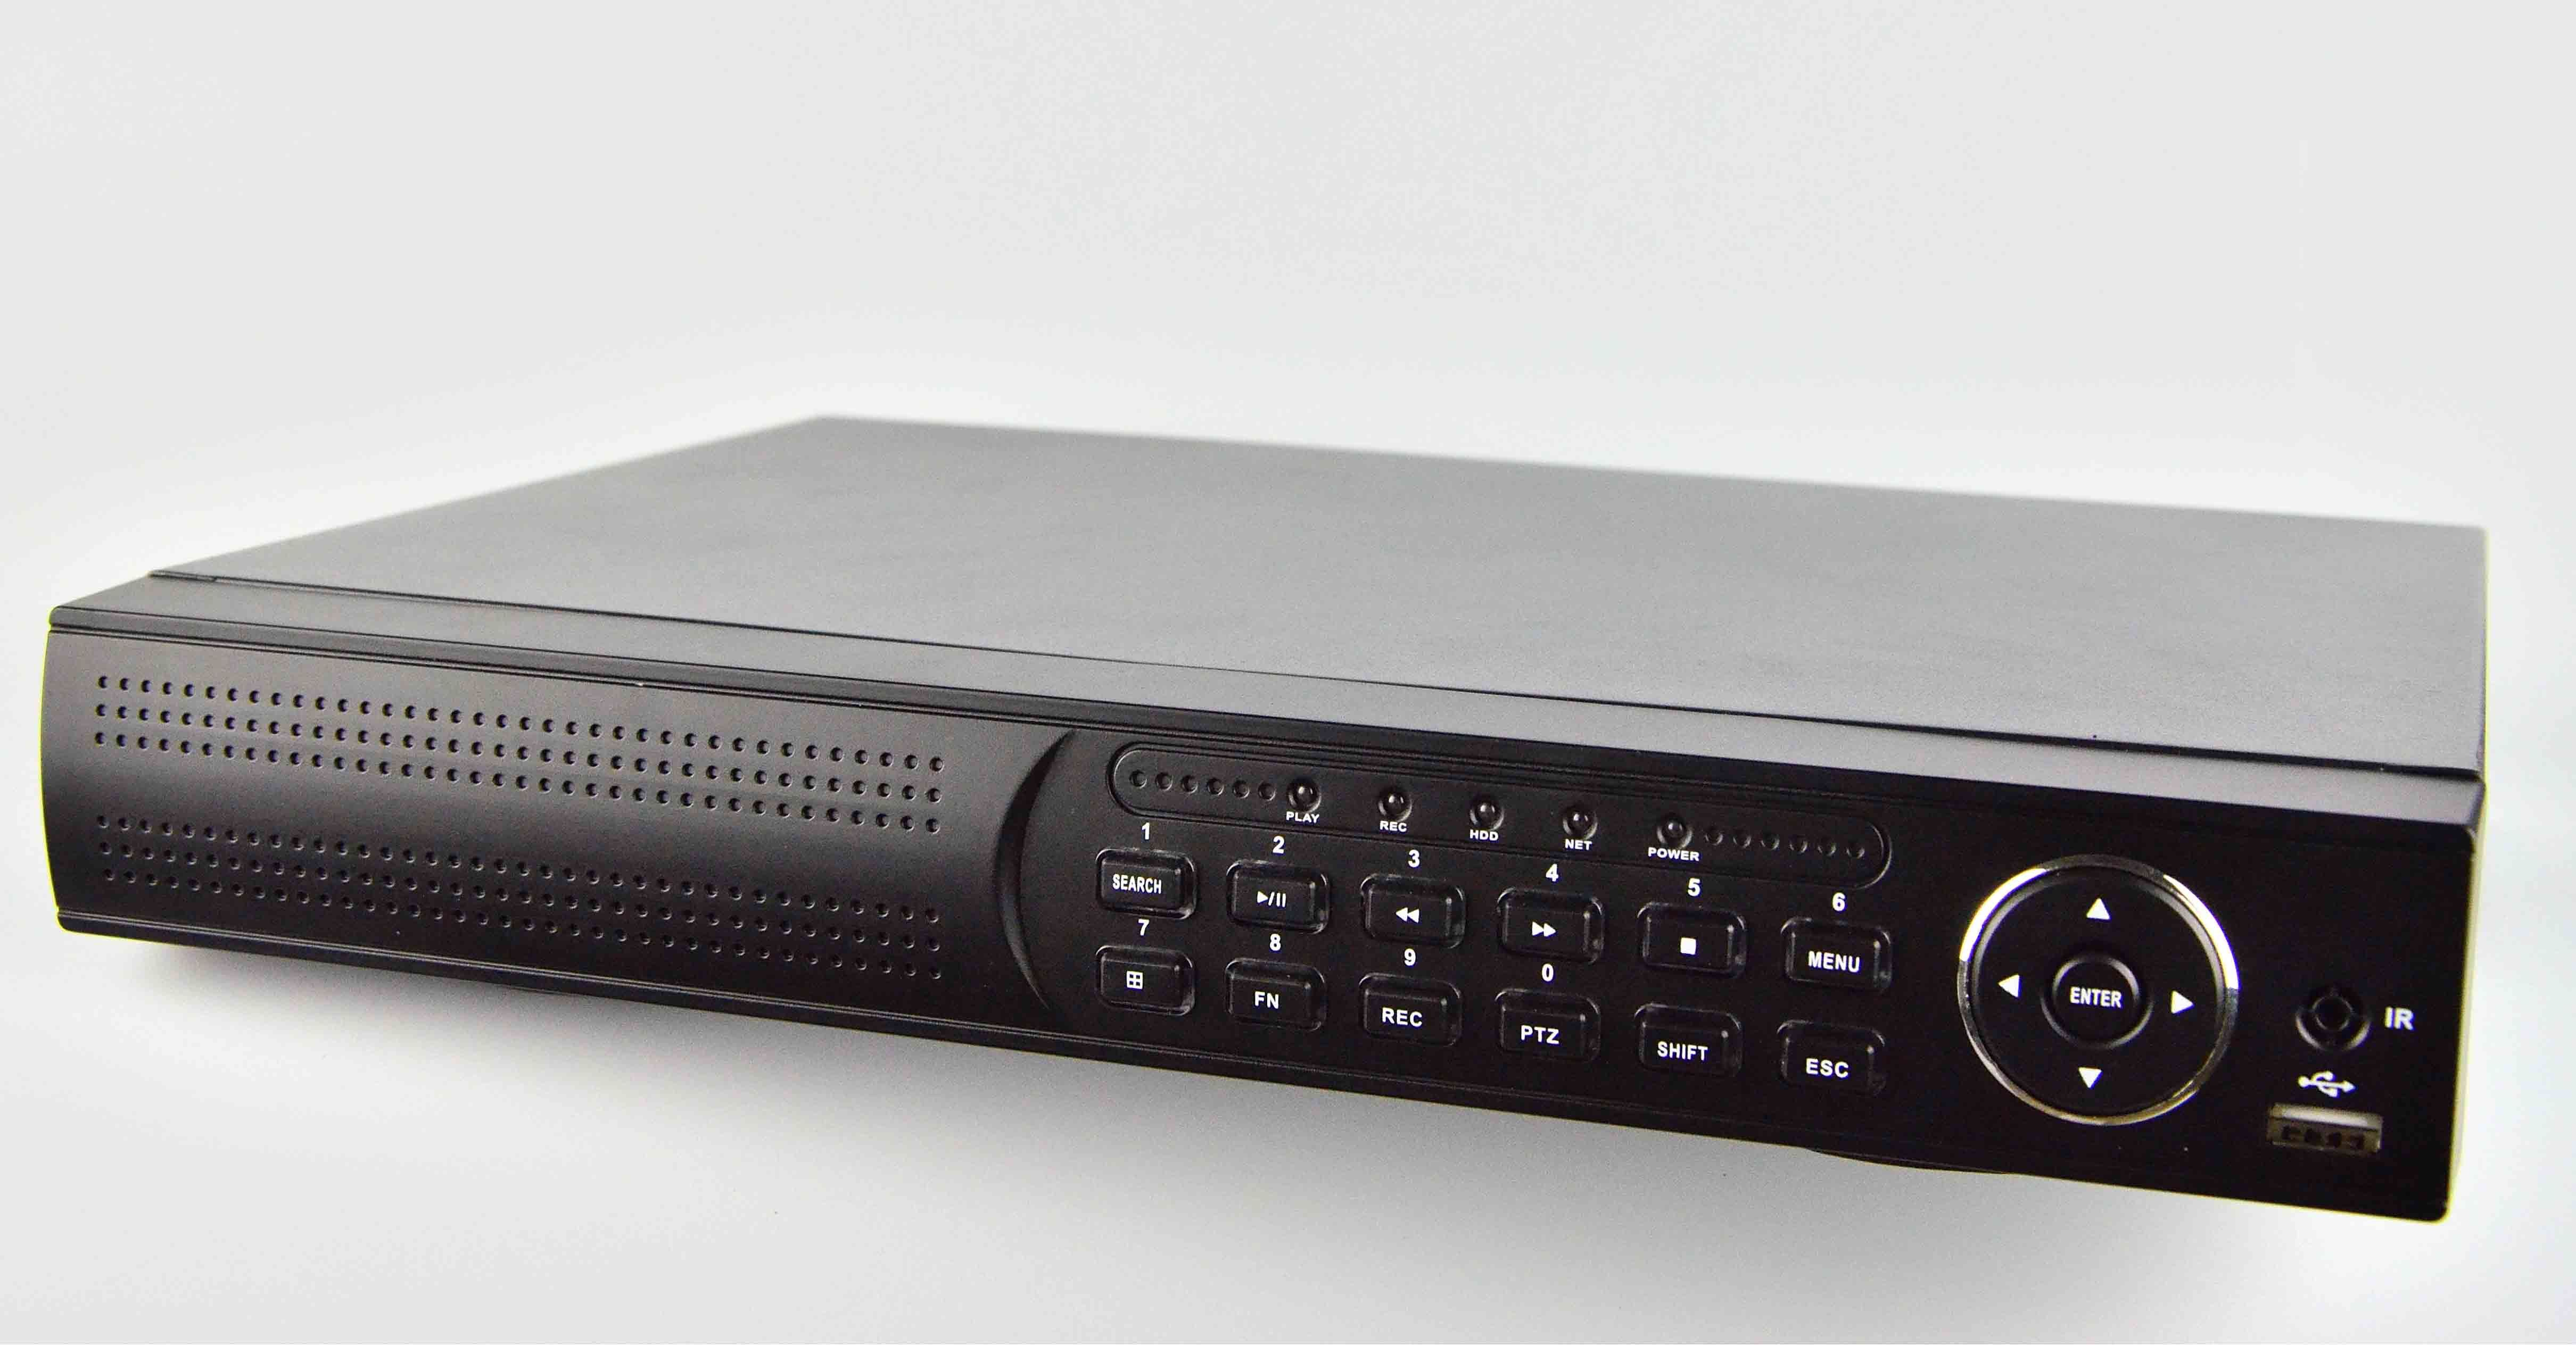 16CH (D1) H. 264 CCTV Security Camera DVR (EV-CH16-N1307)